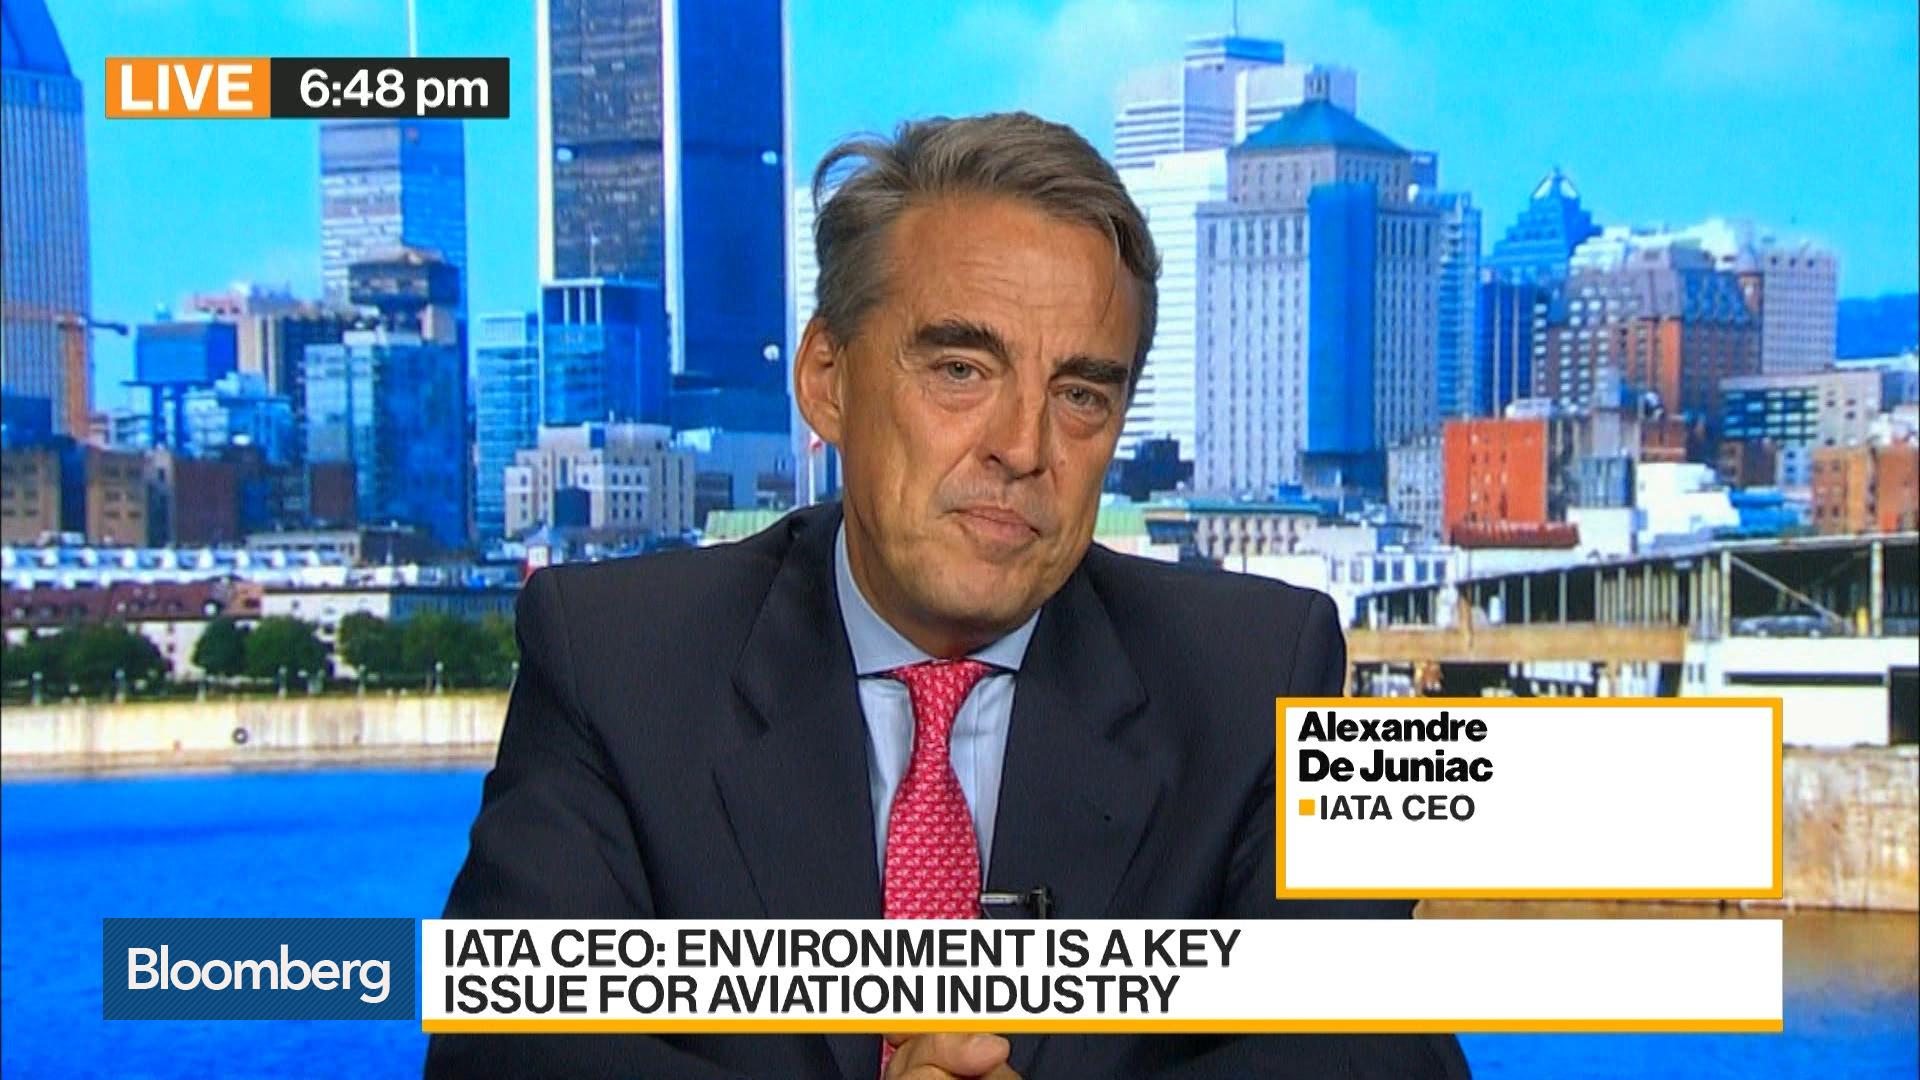 Alexandre De Juniac, CEO of IATA, on Boeing 737 Max, Travel Demand, Drones